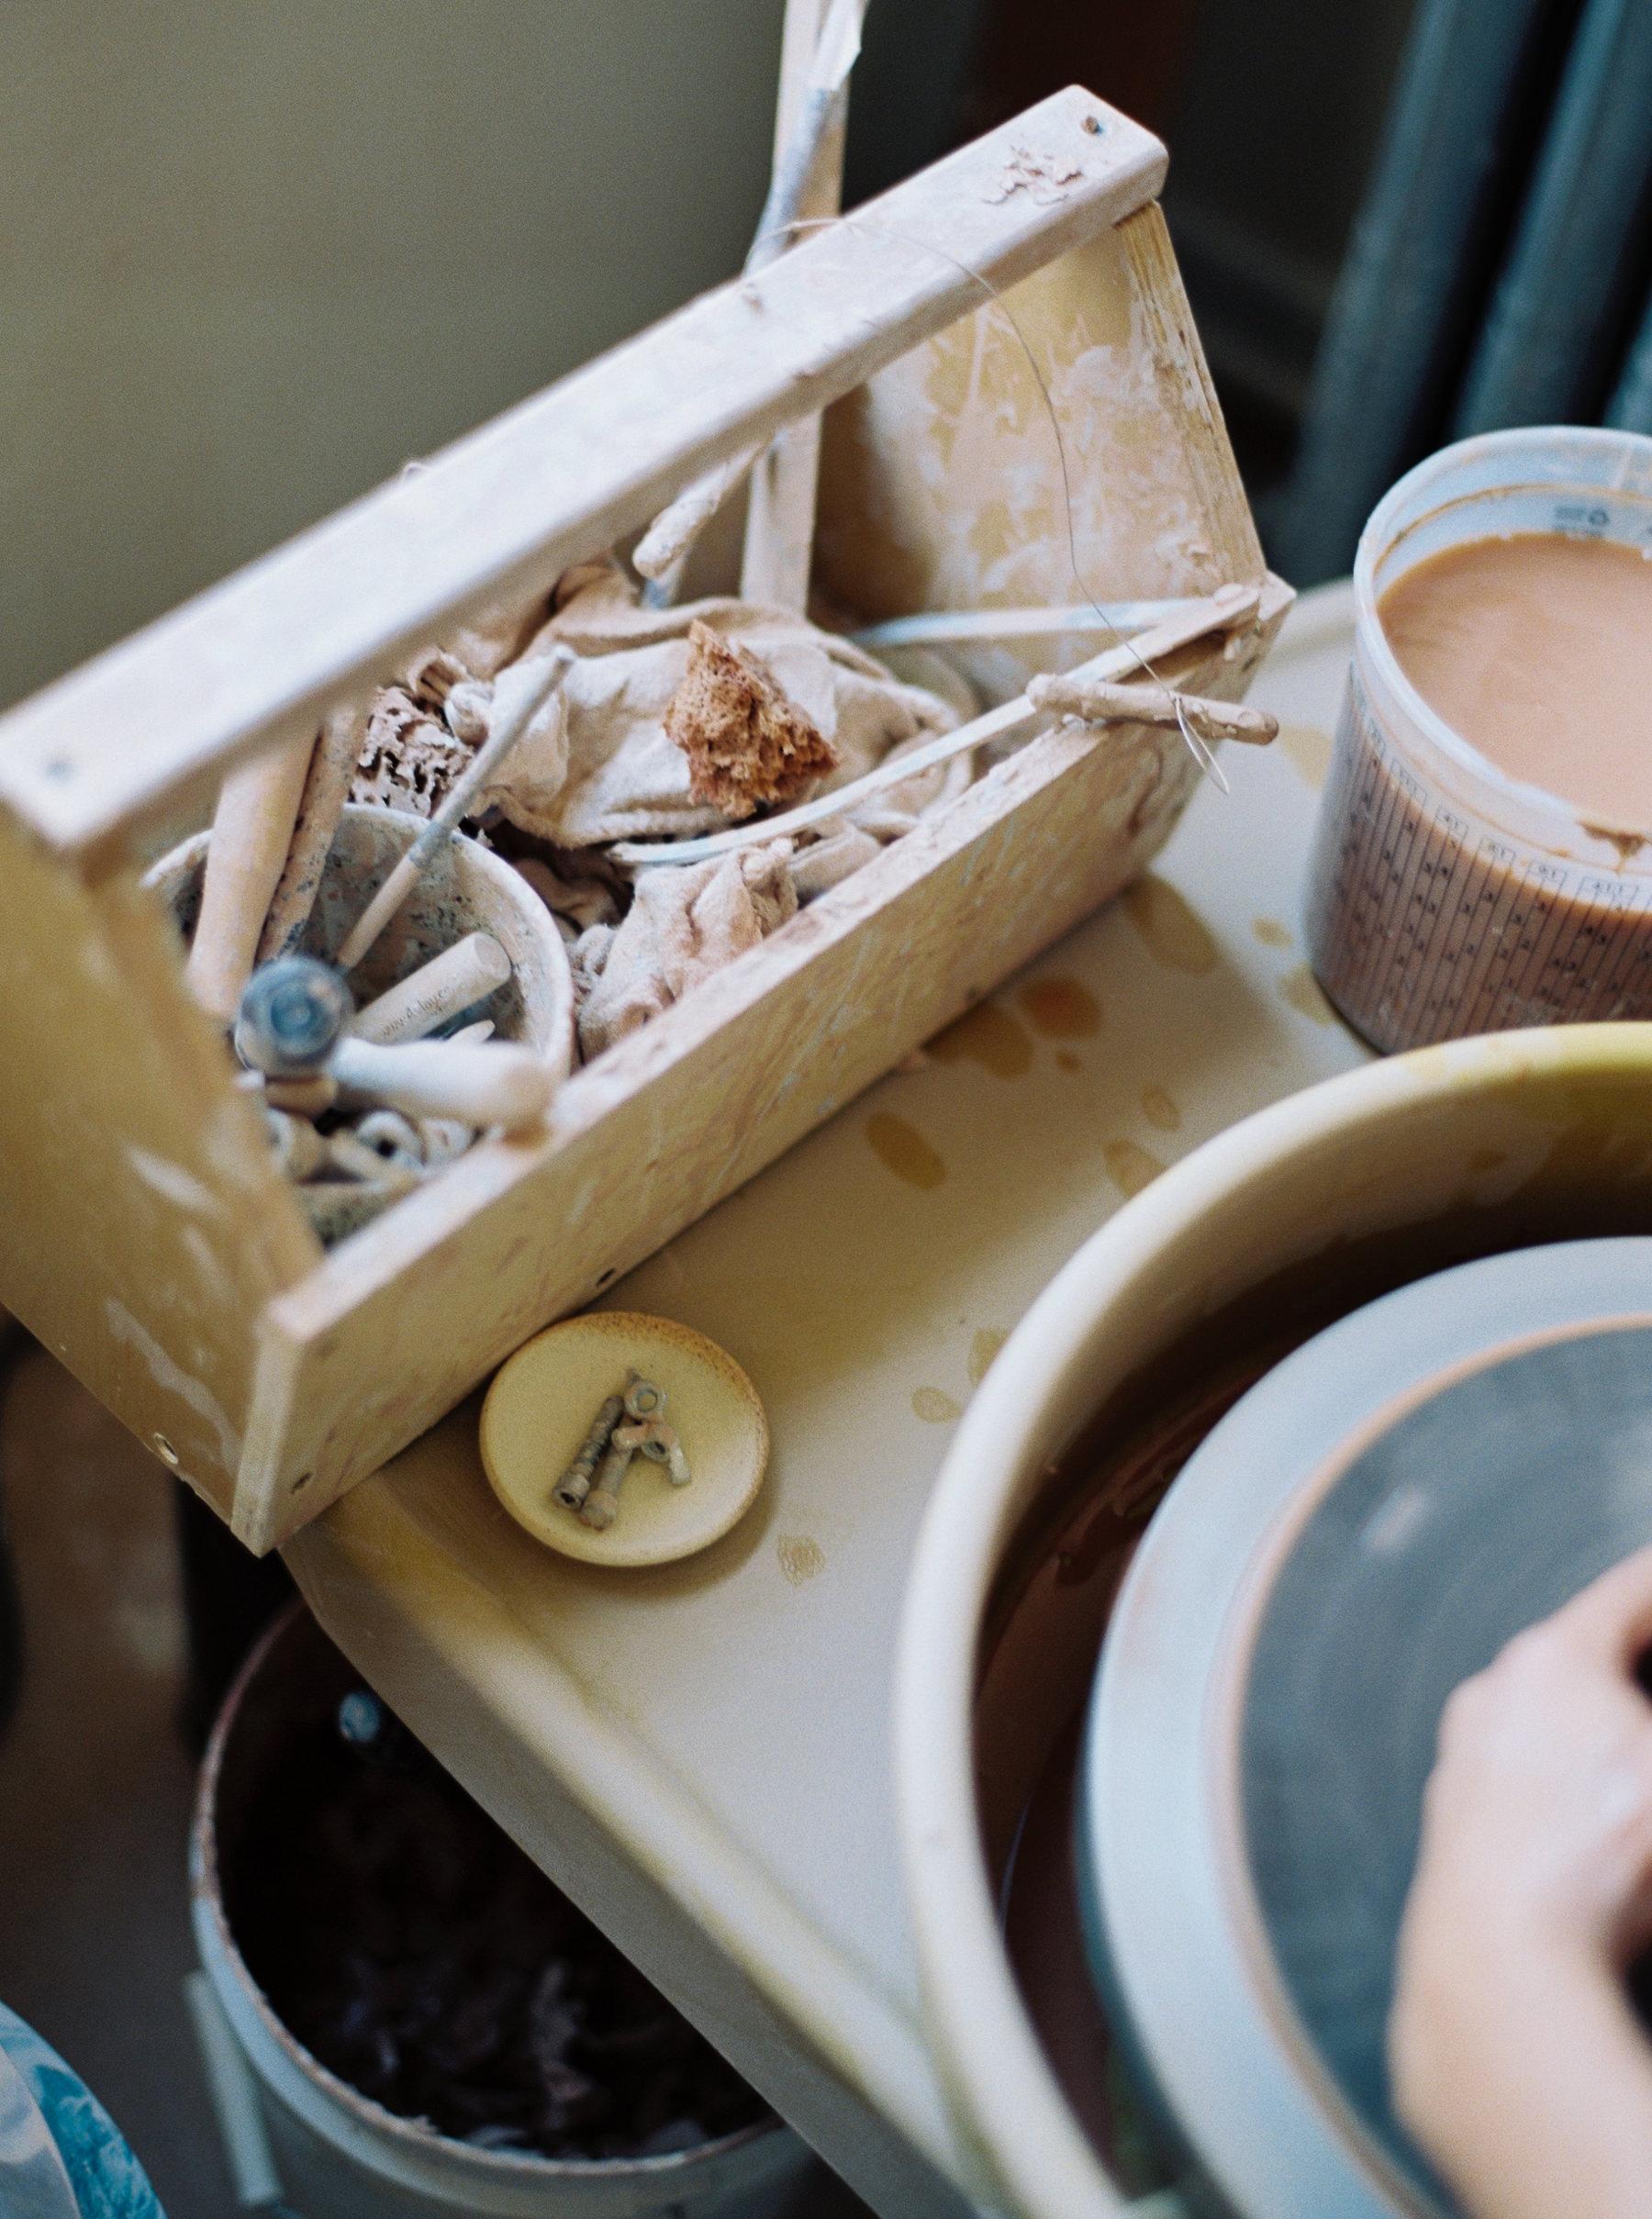 artistprofile-katherinemoes-pottery-annapeters-annapetersphoto-unearthing.tc-7.jpg